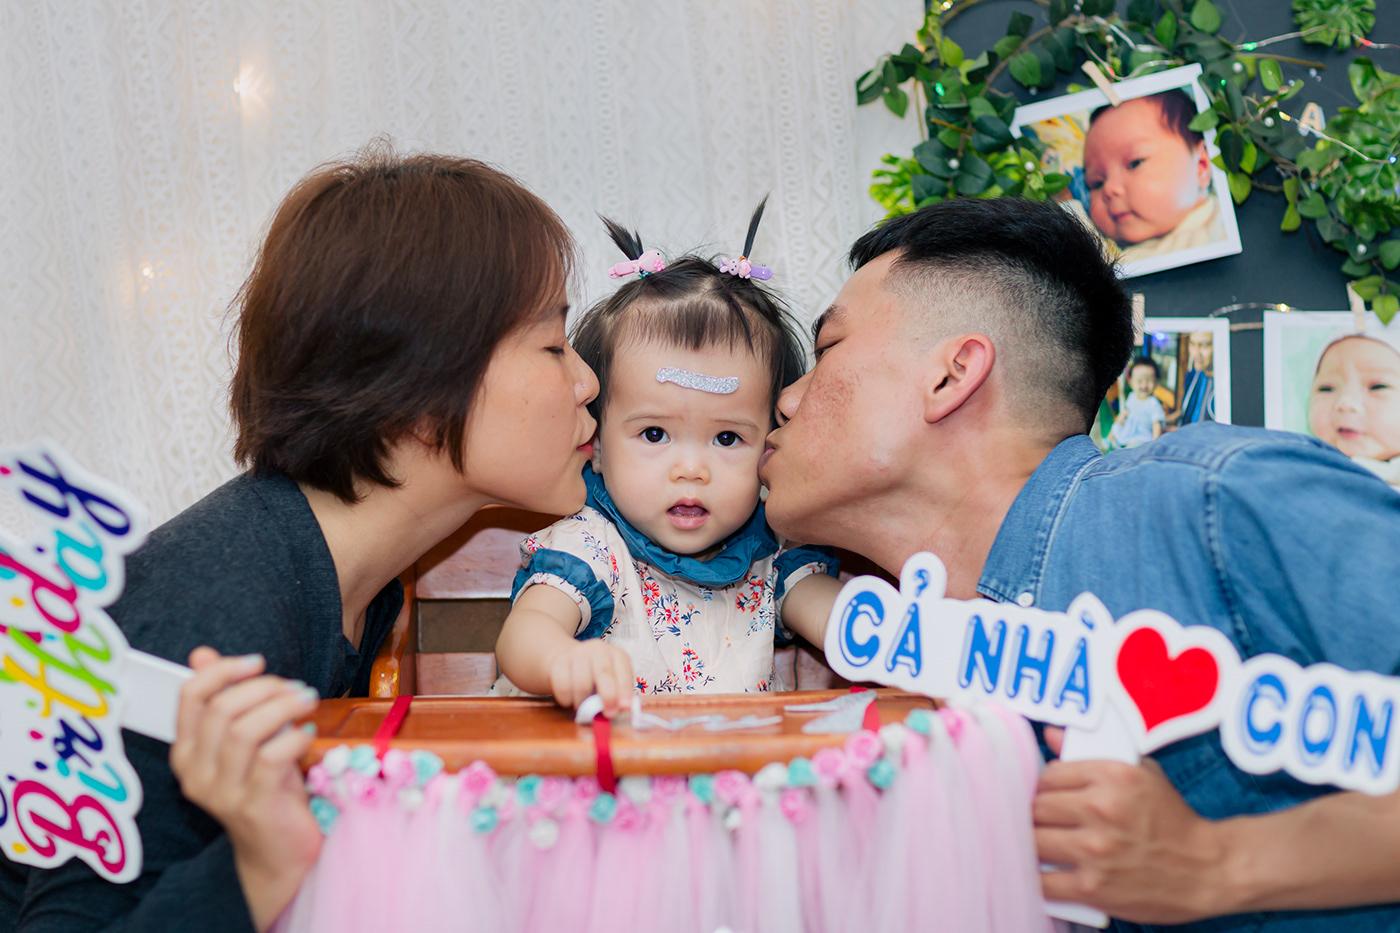 birthday photography children photography digital photography  Family Documentary family photography family photojournalism family portrait reportage